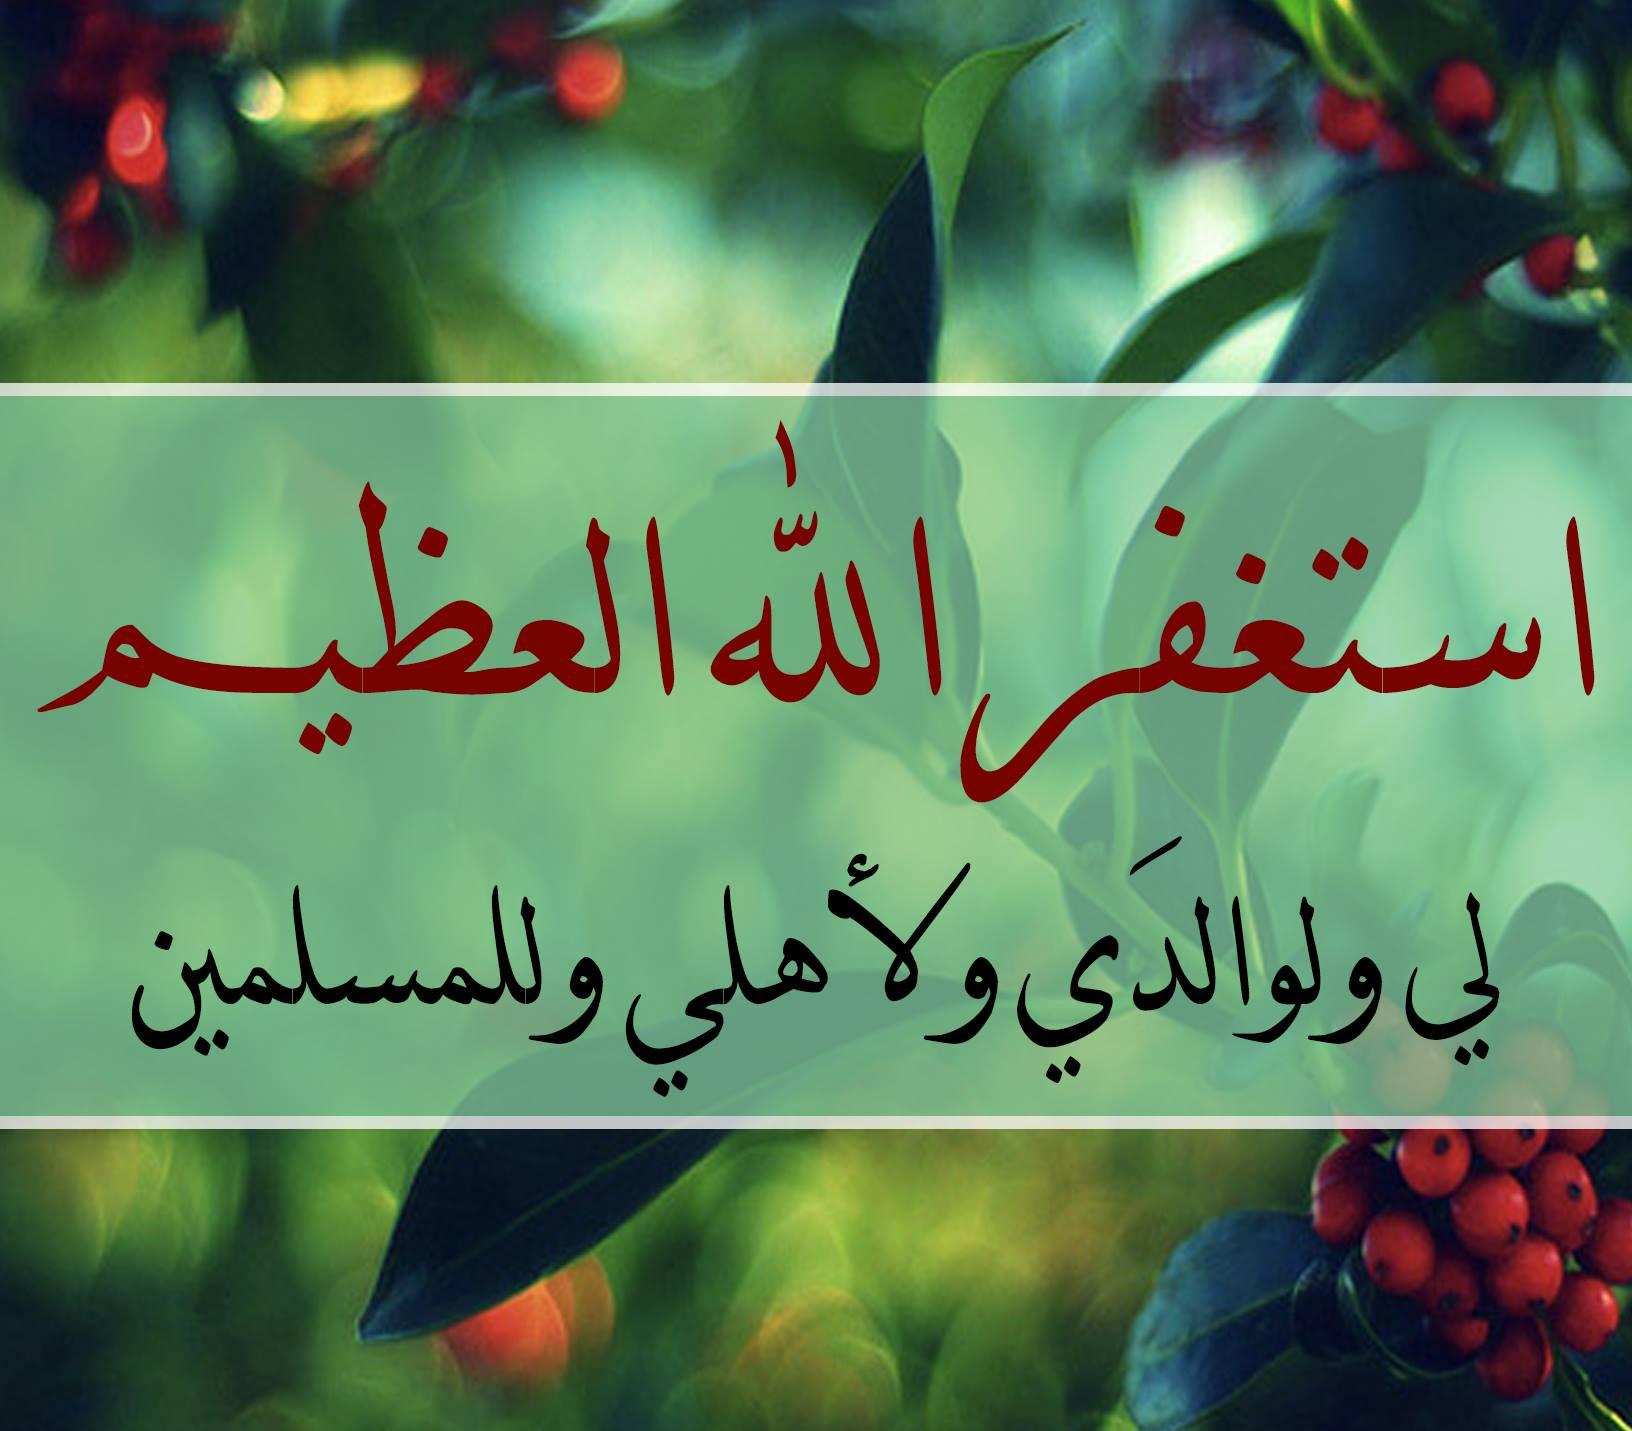 بالصور صوردينيه اسلاميه , اجمل صور دينيه اسلامية 3630 6